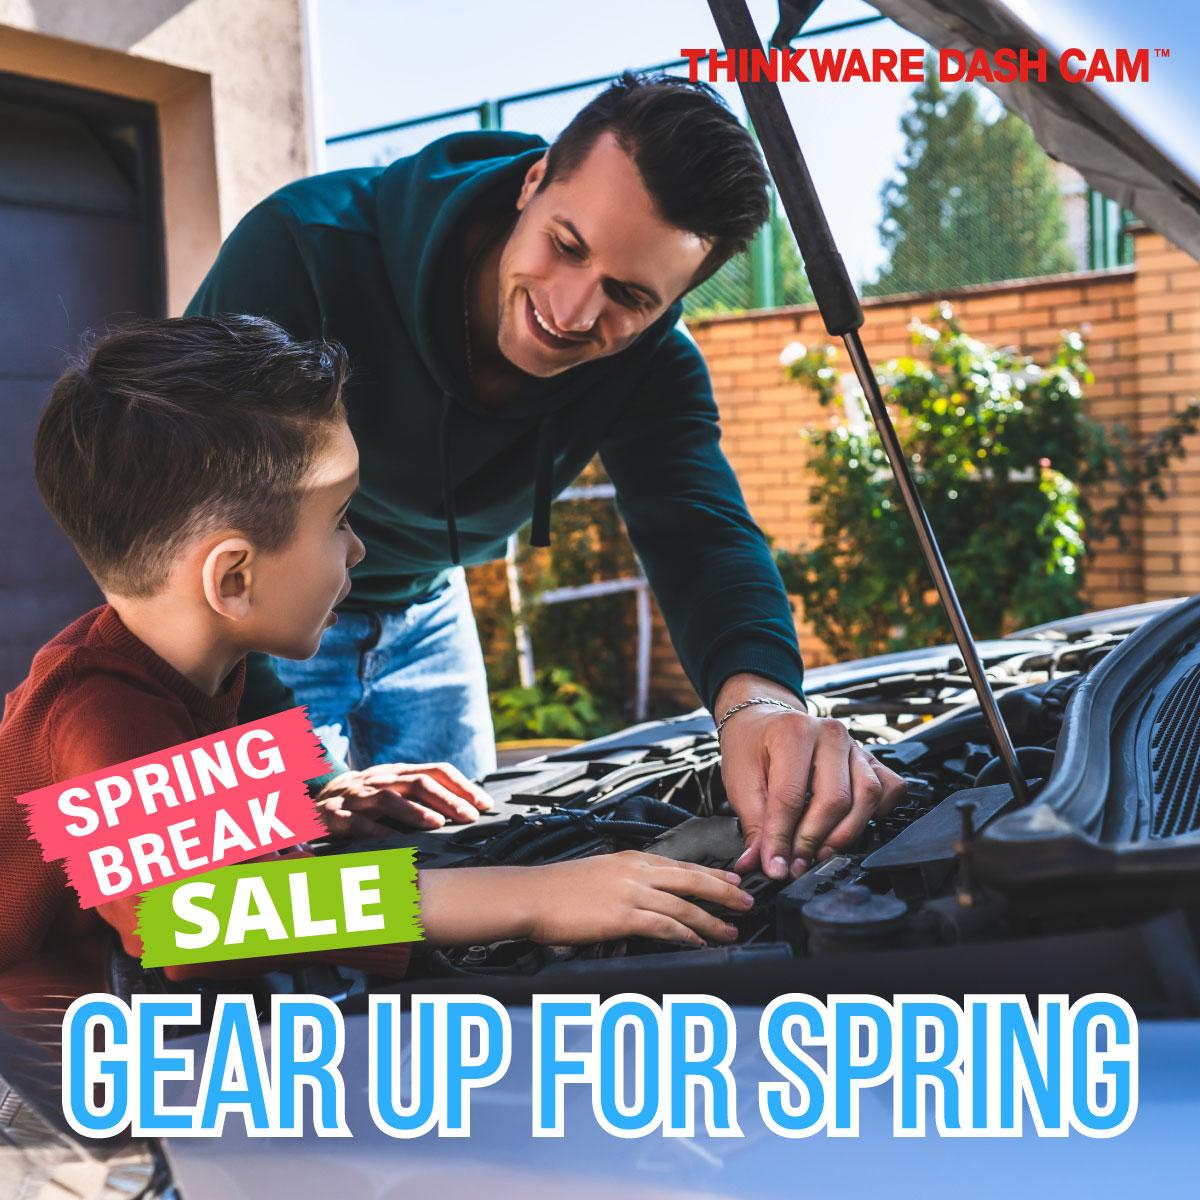 20210301 US Spring break promotion